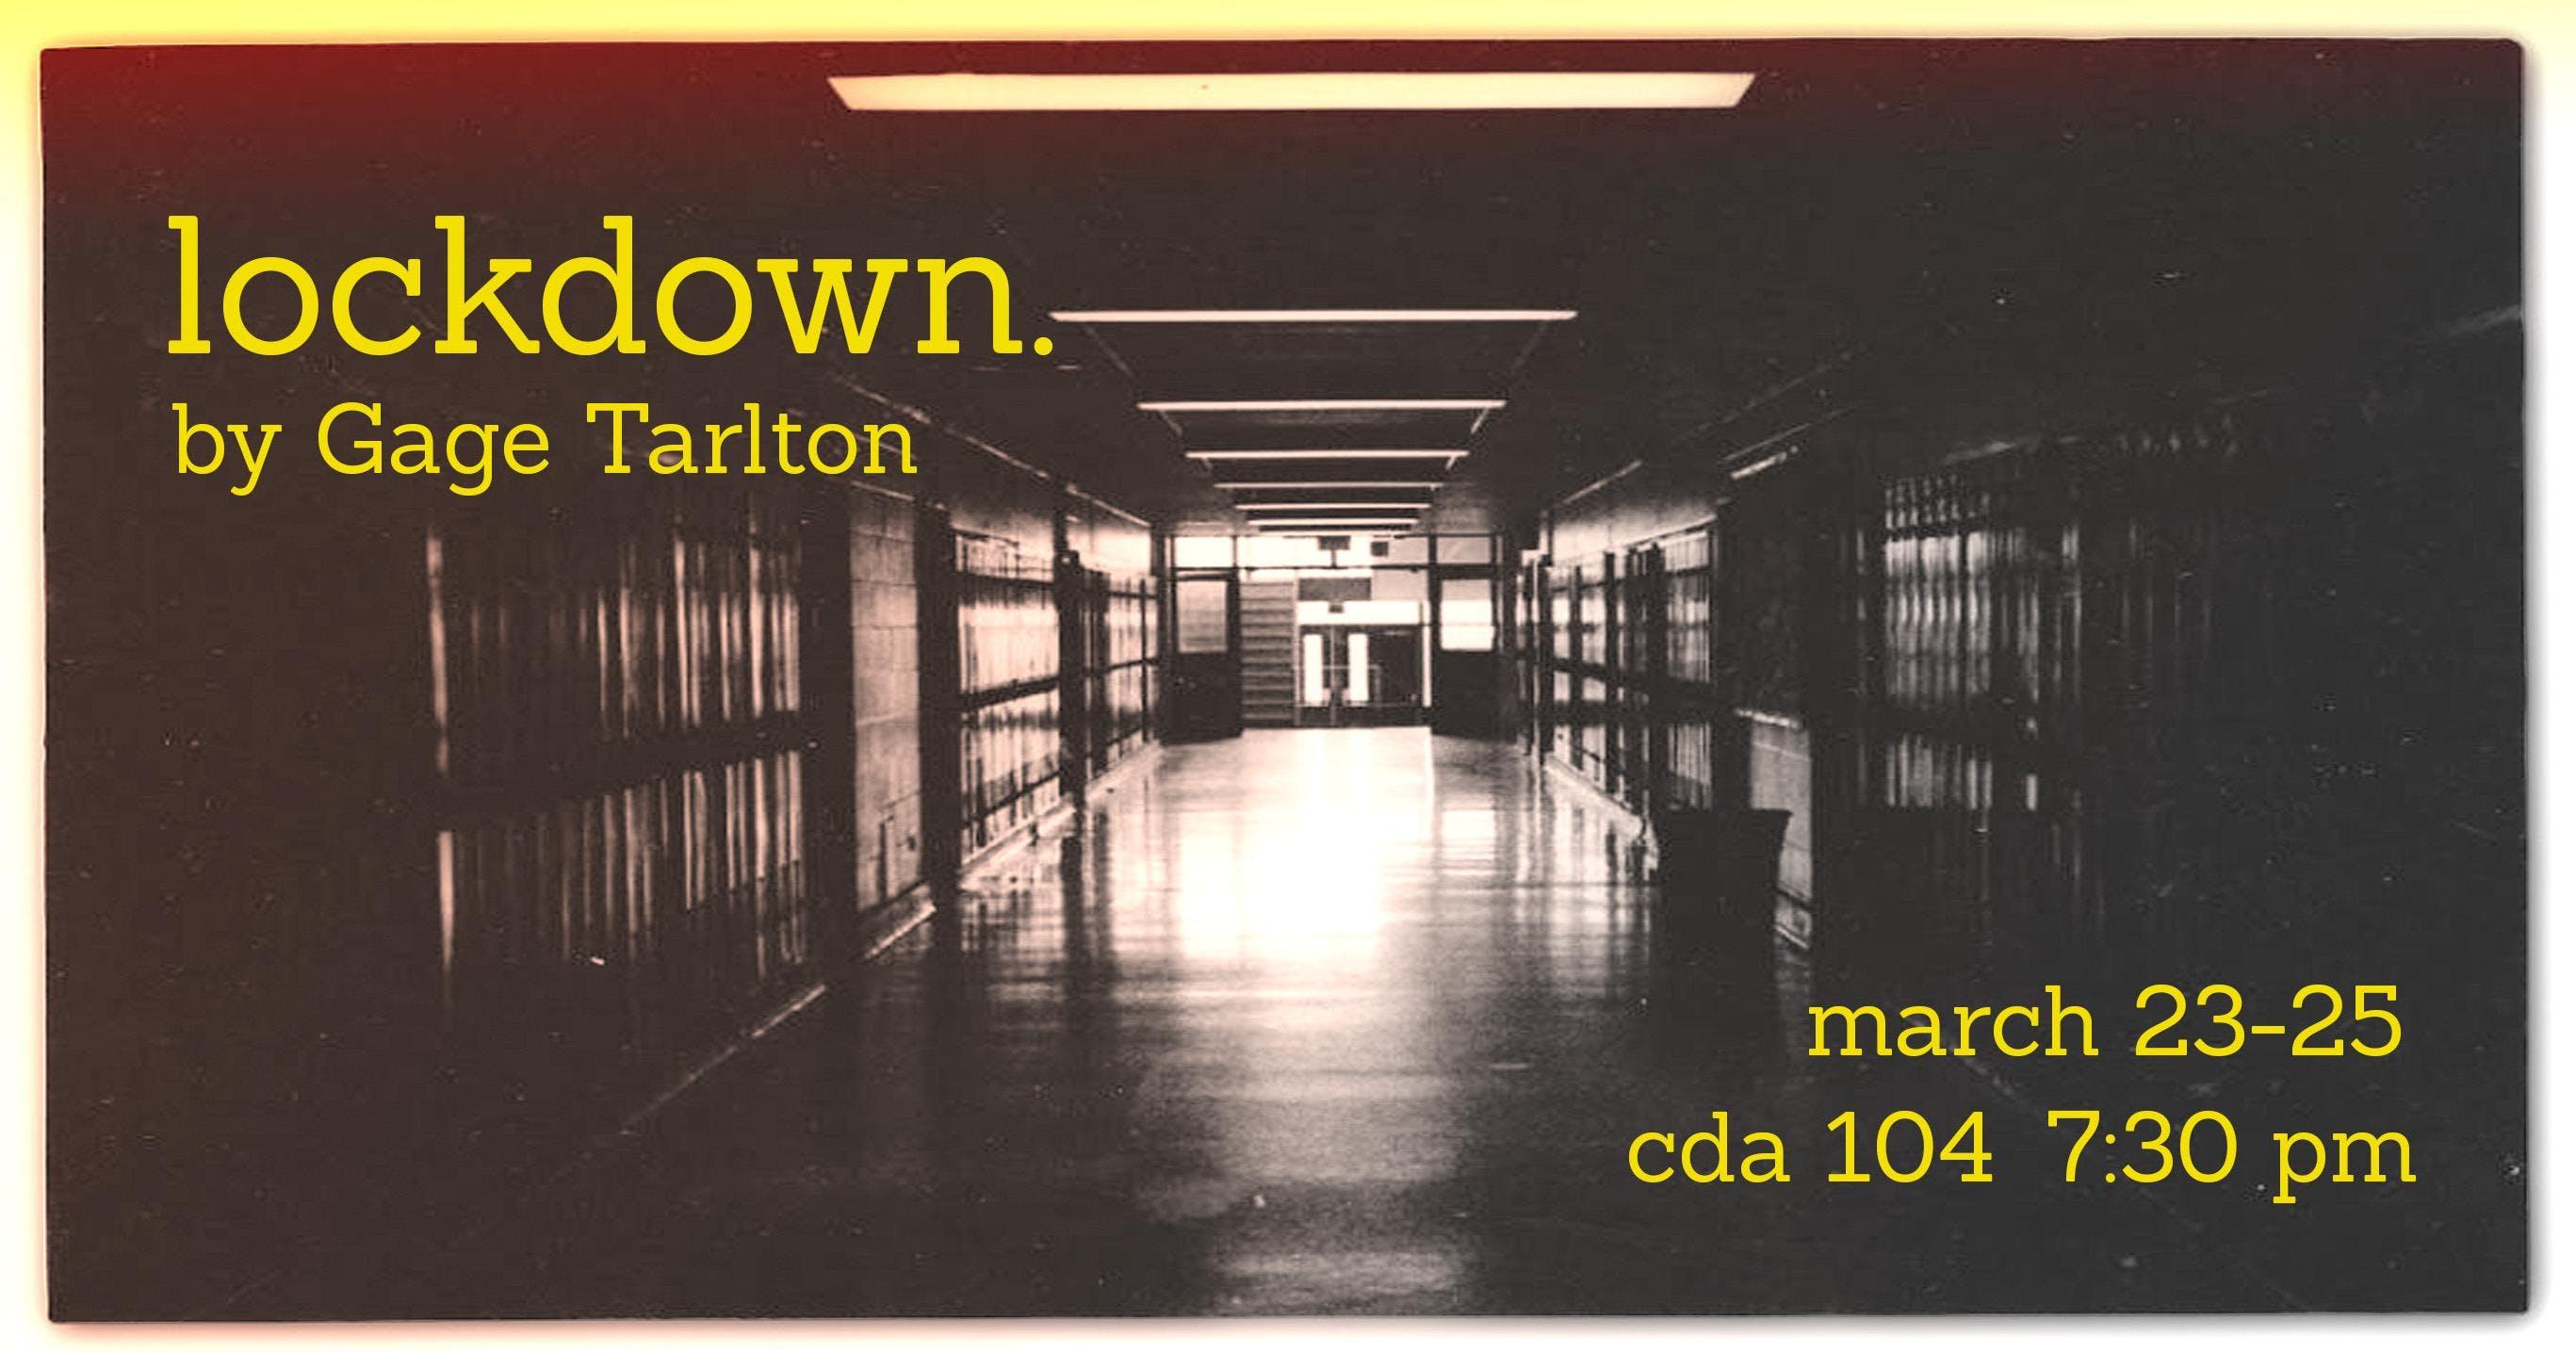 lockdown. (Monday Night)